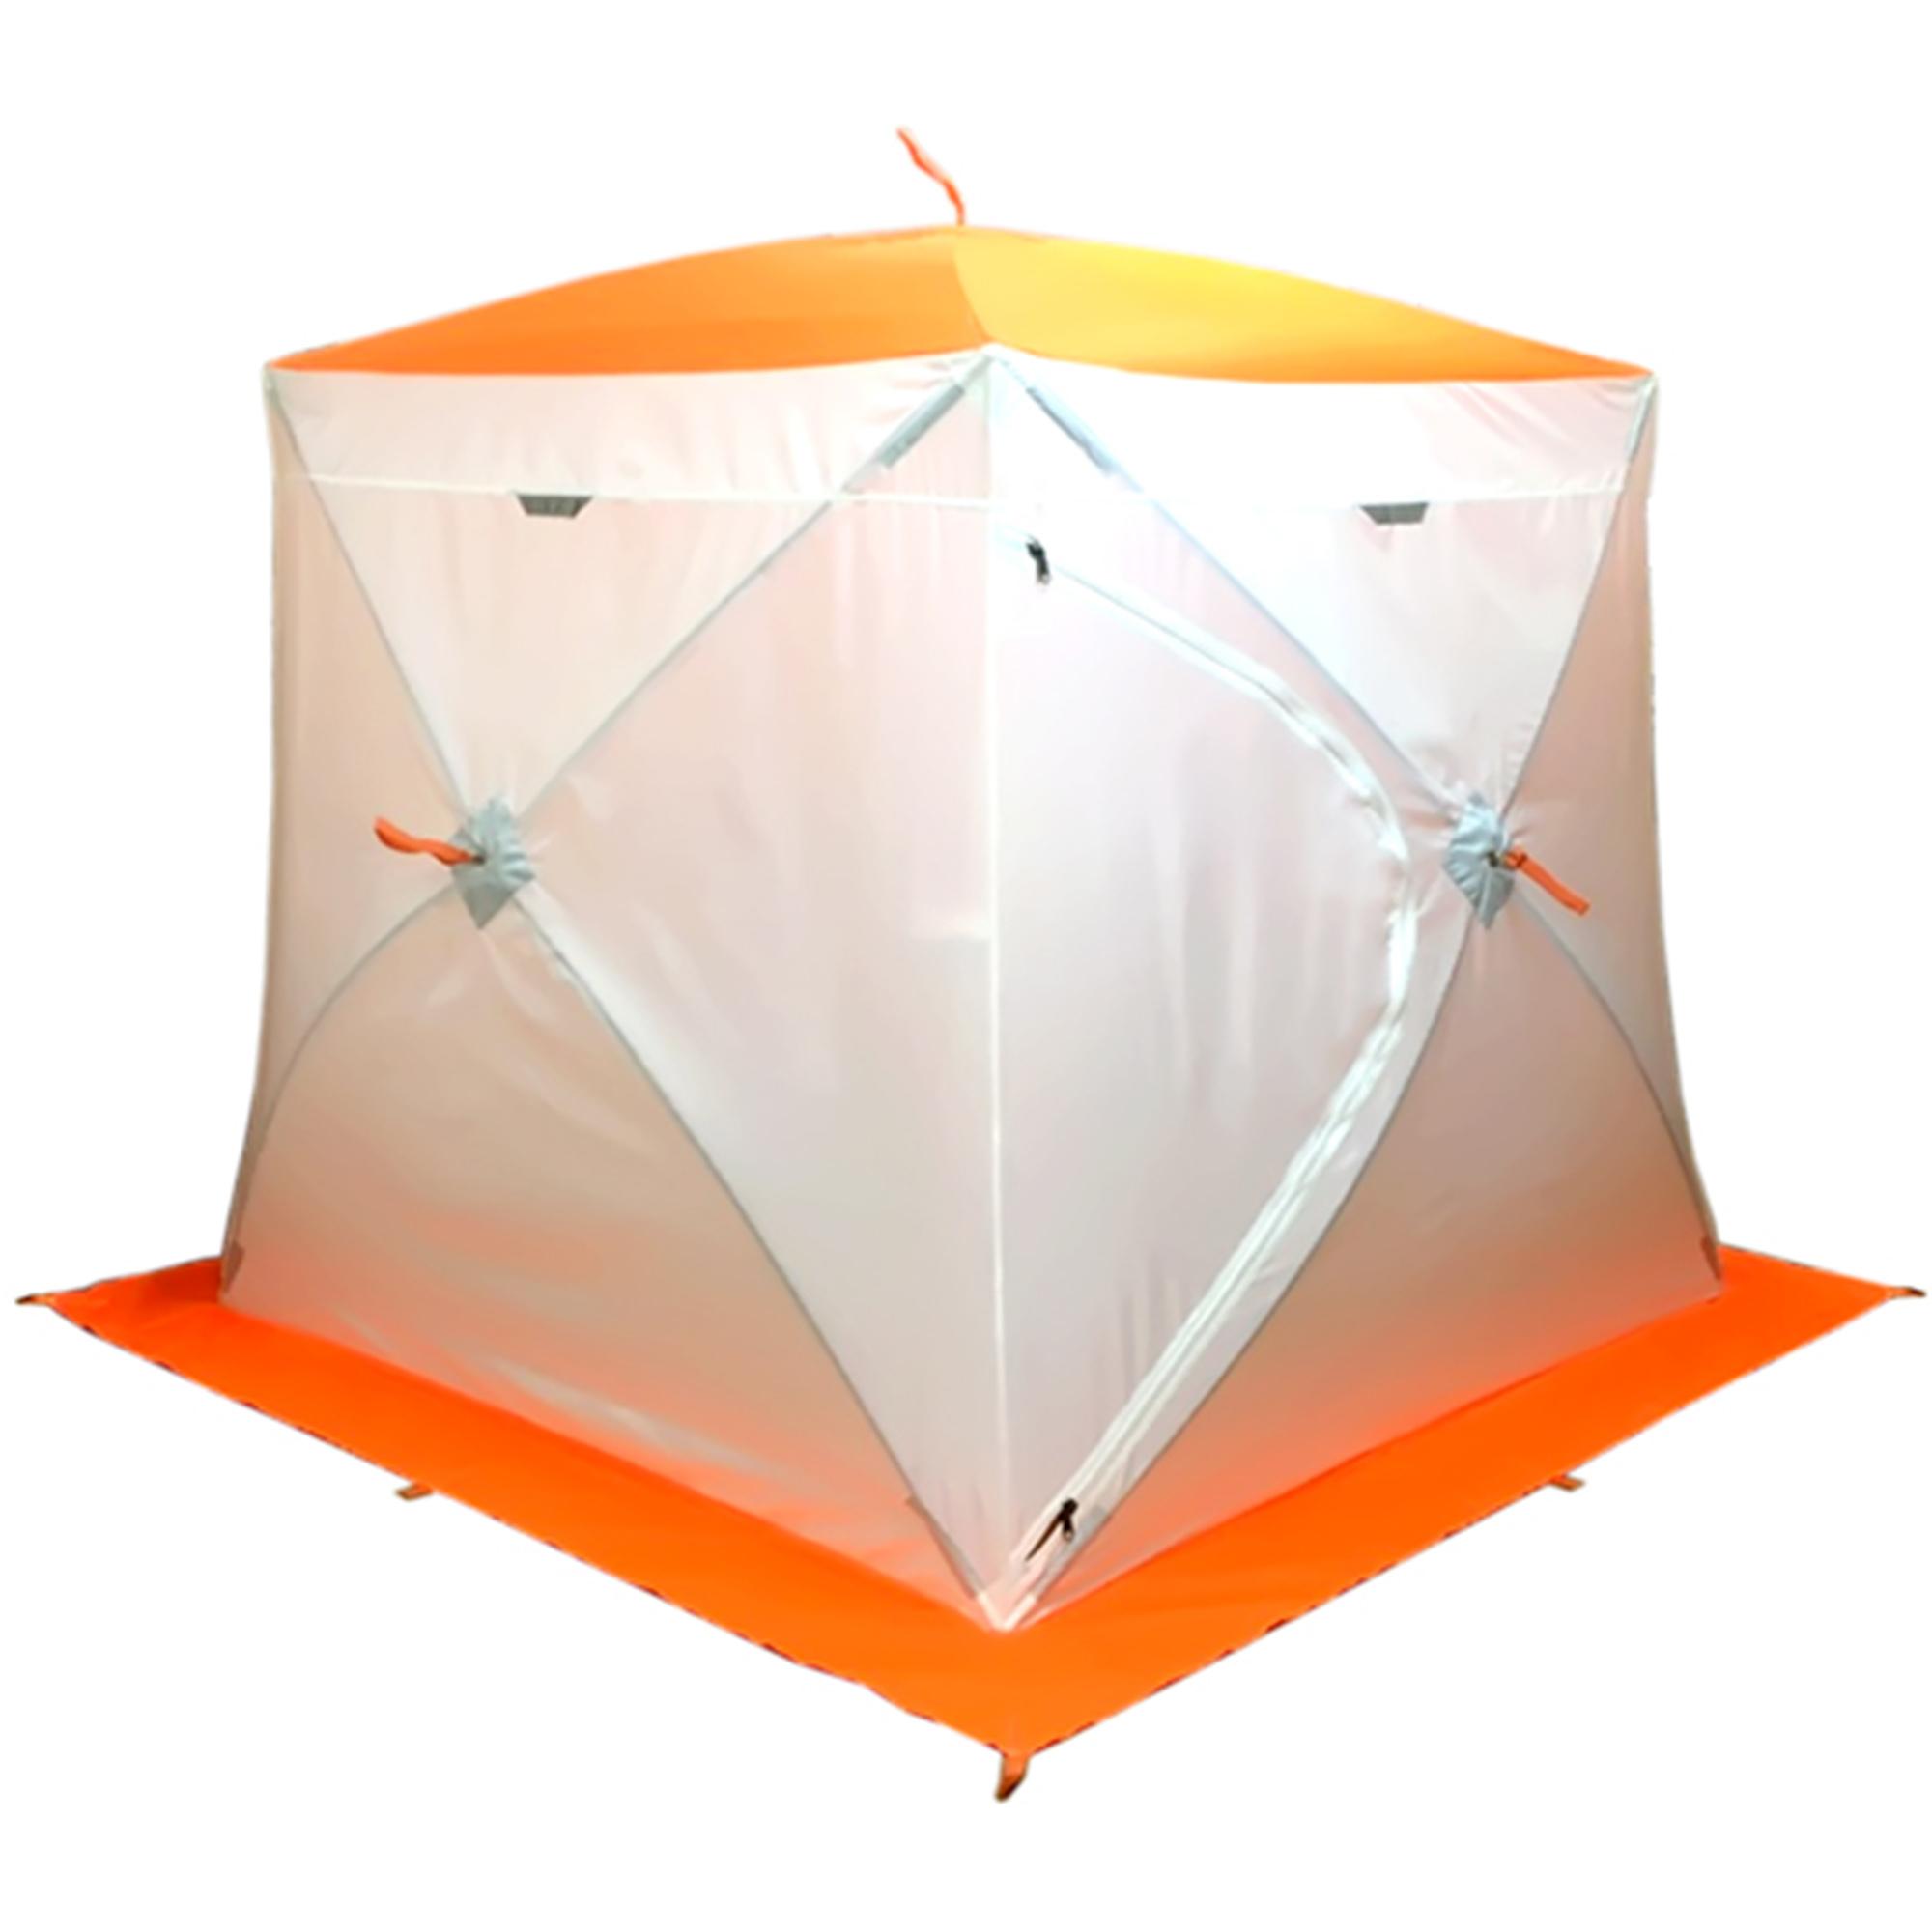 Палатка-куб ПИНГВИН MrFisher 200 ST, Палатки - арт. 1128440162